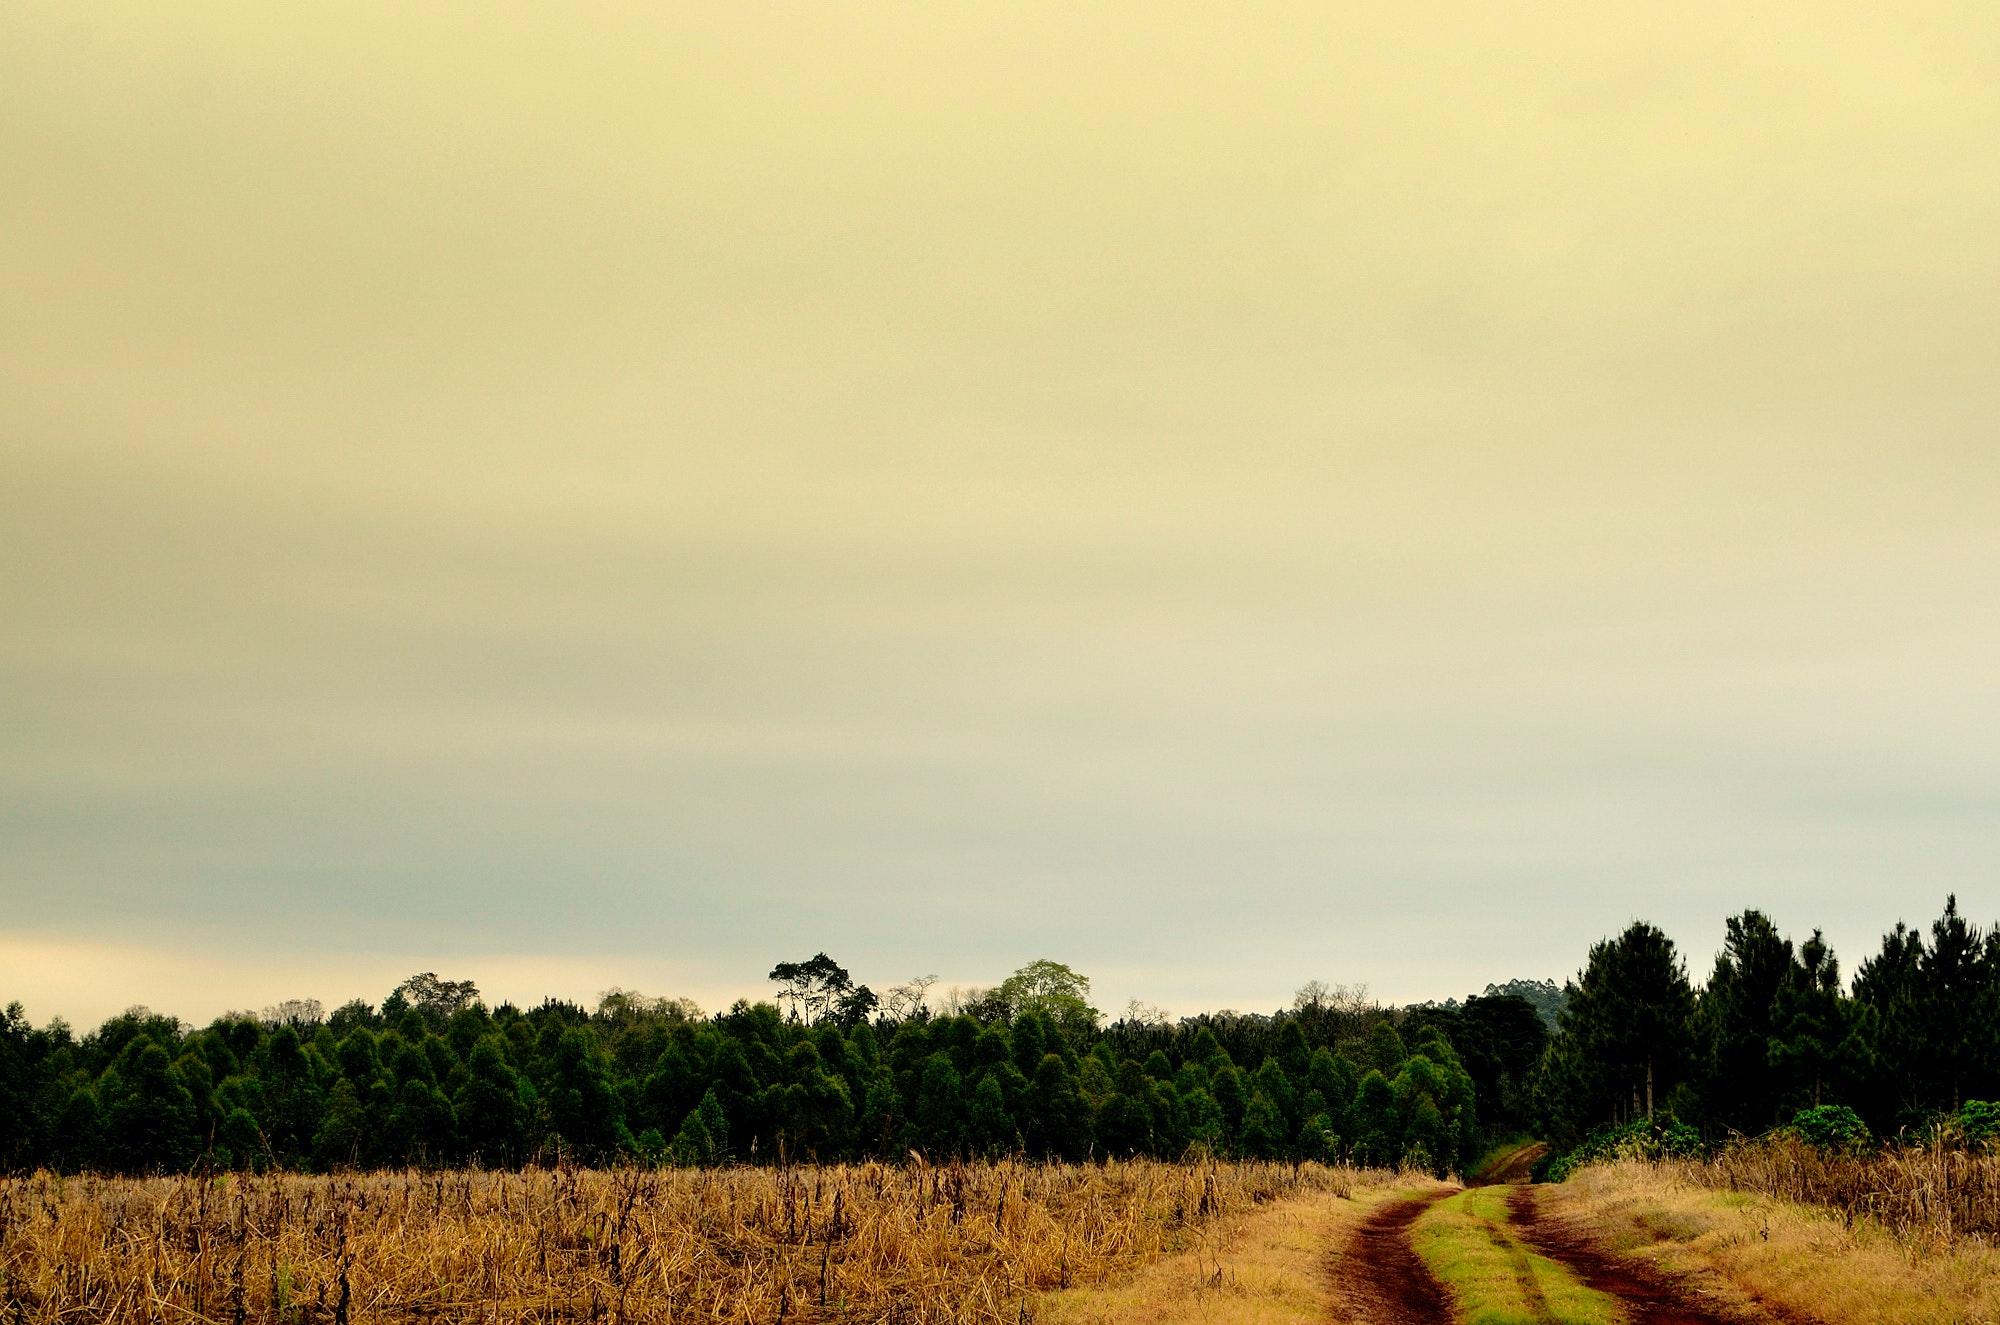 Sunrise On Green Grass Field 183 Free Stock Photo